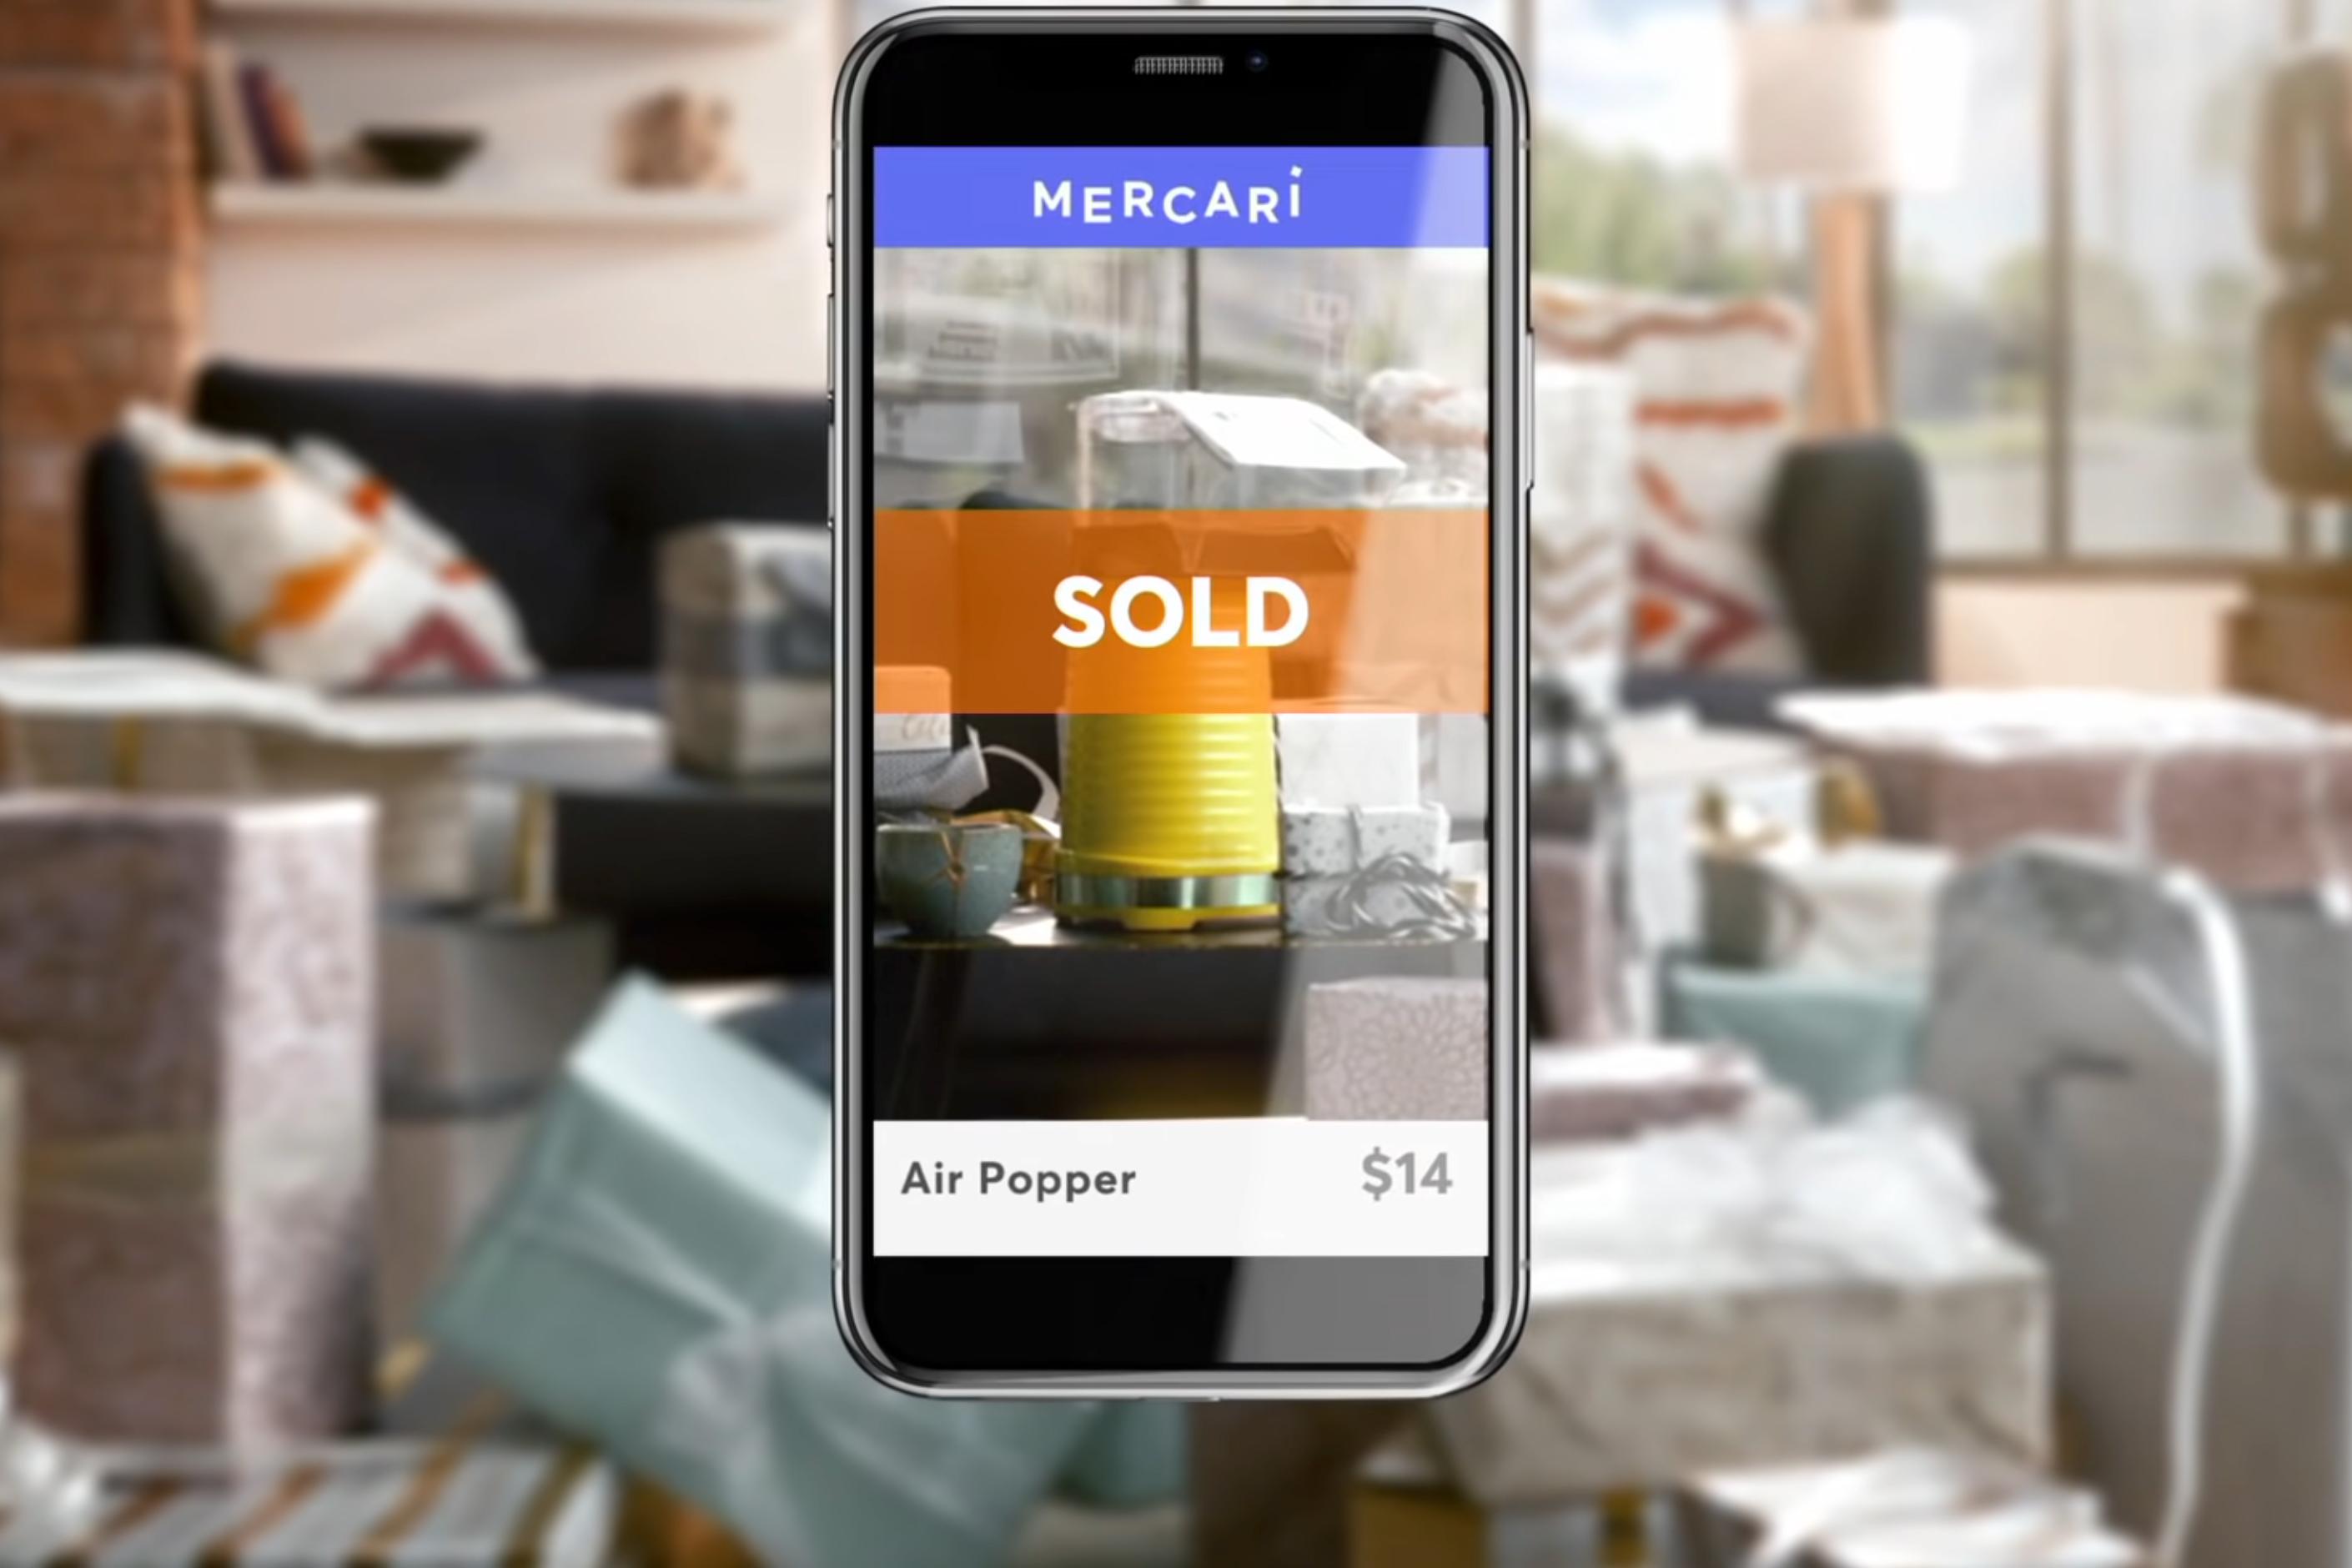 E-commerce platform Mercari will air first Super Bowl commercial